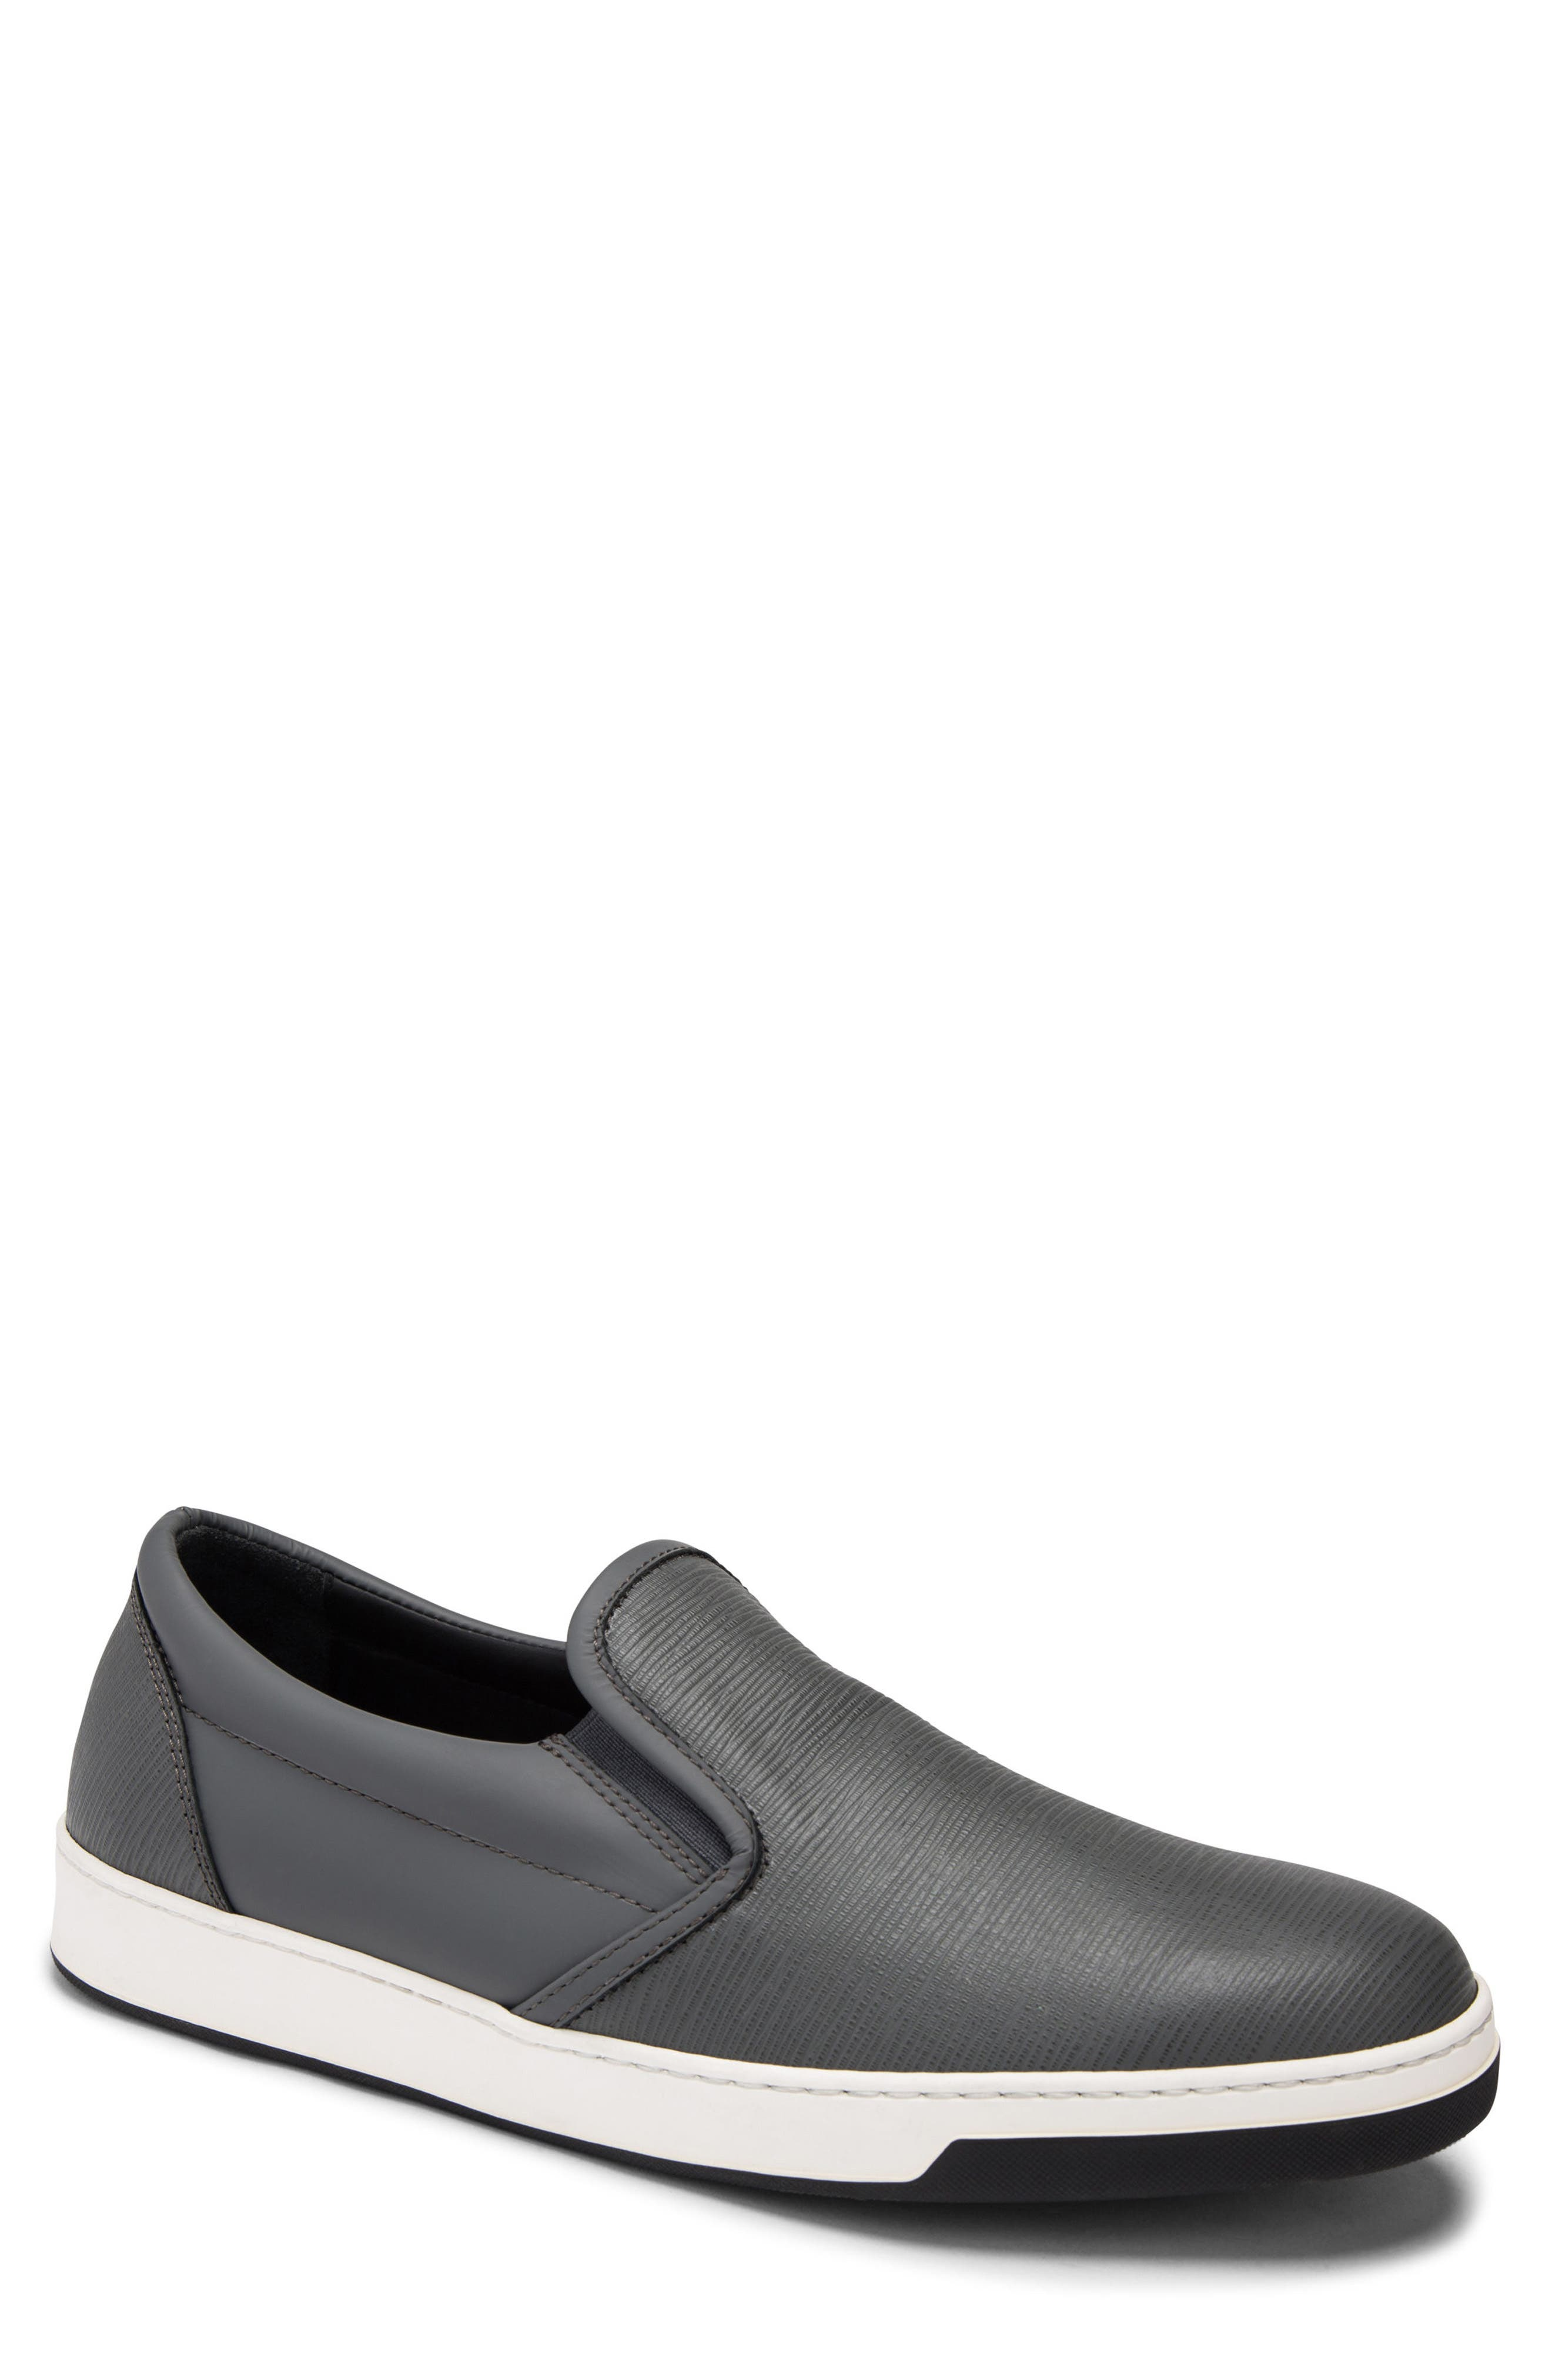 Santorini Slip-On Sneaker,                             Main thumbnail 1, color,                             GRAFITE